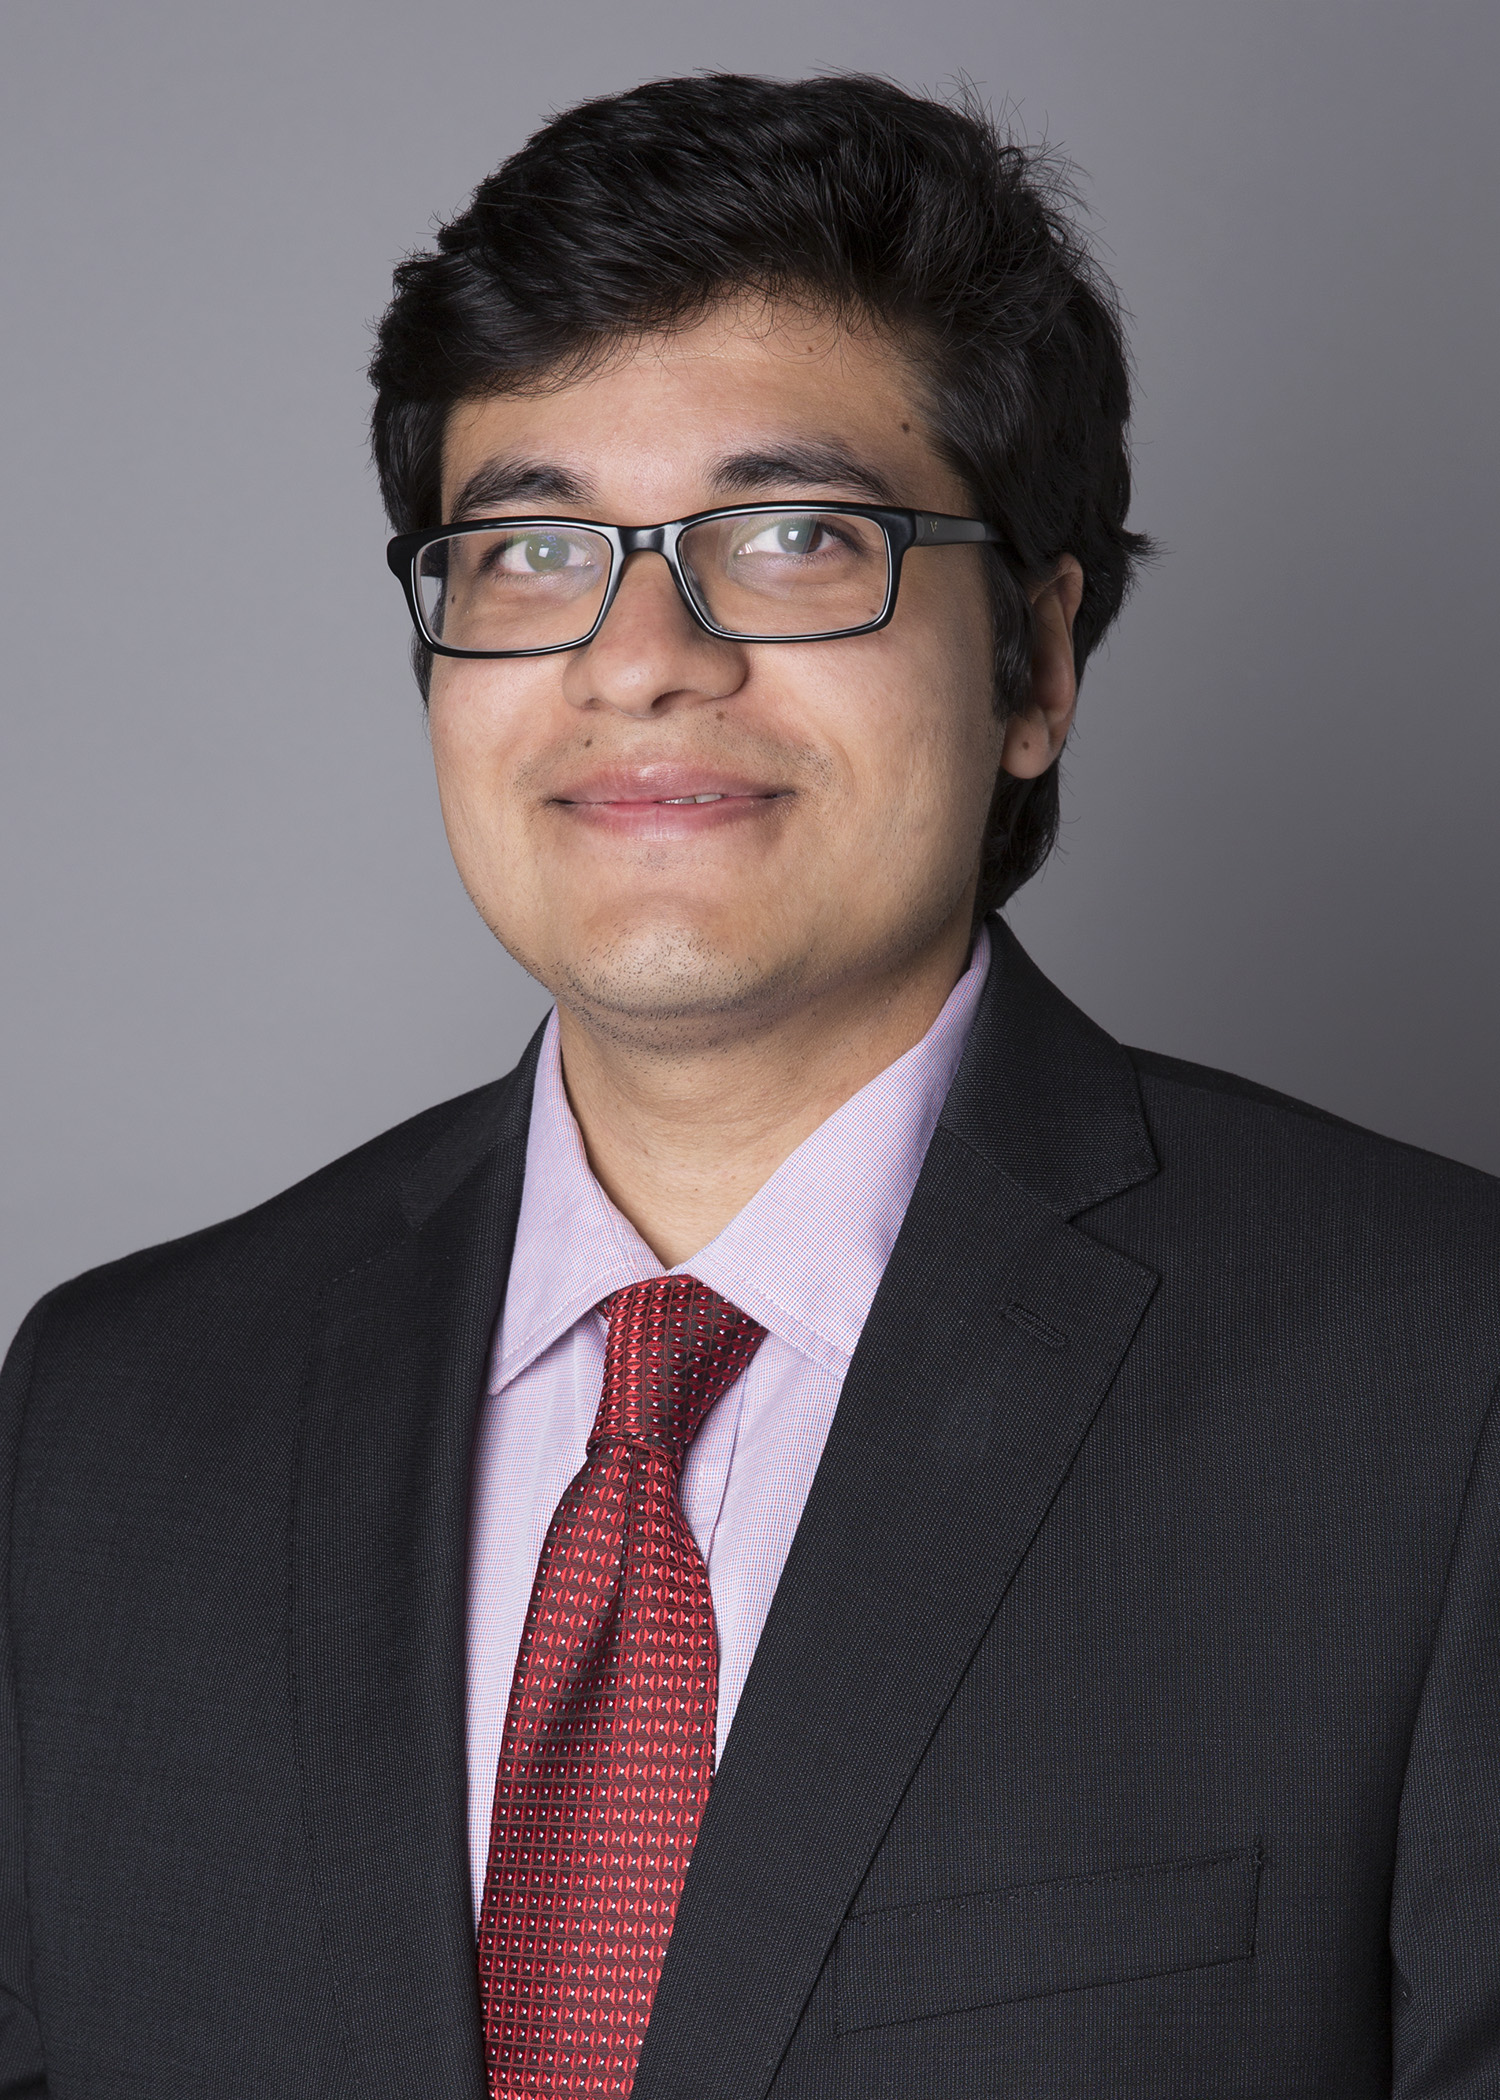 Headshot of Geet Shah